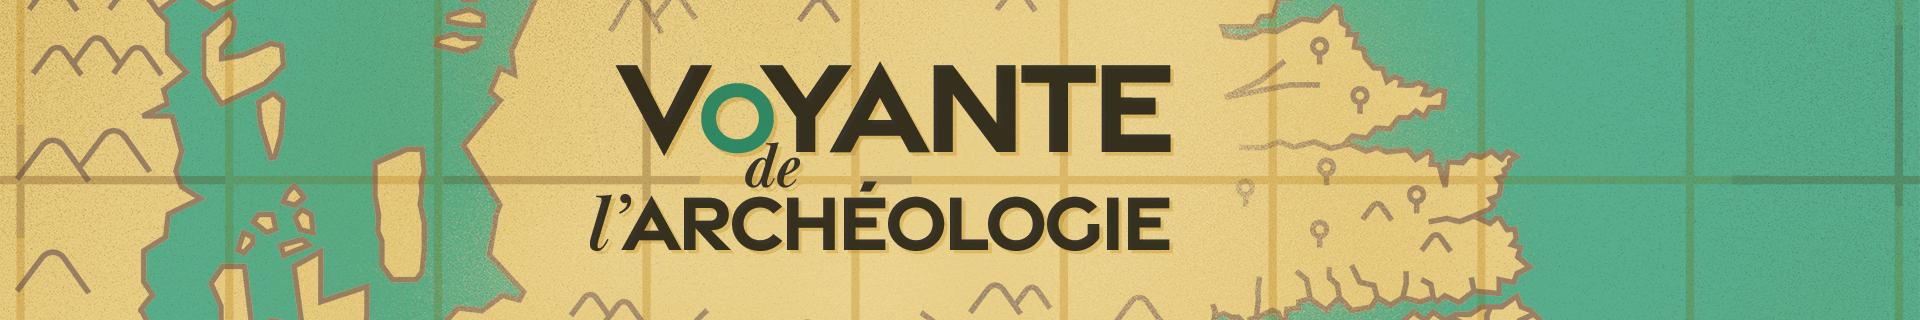 balado voyante de l'archéologie